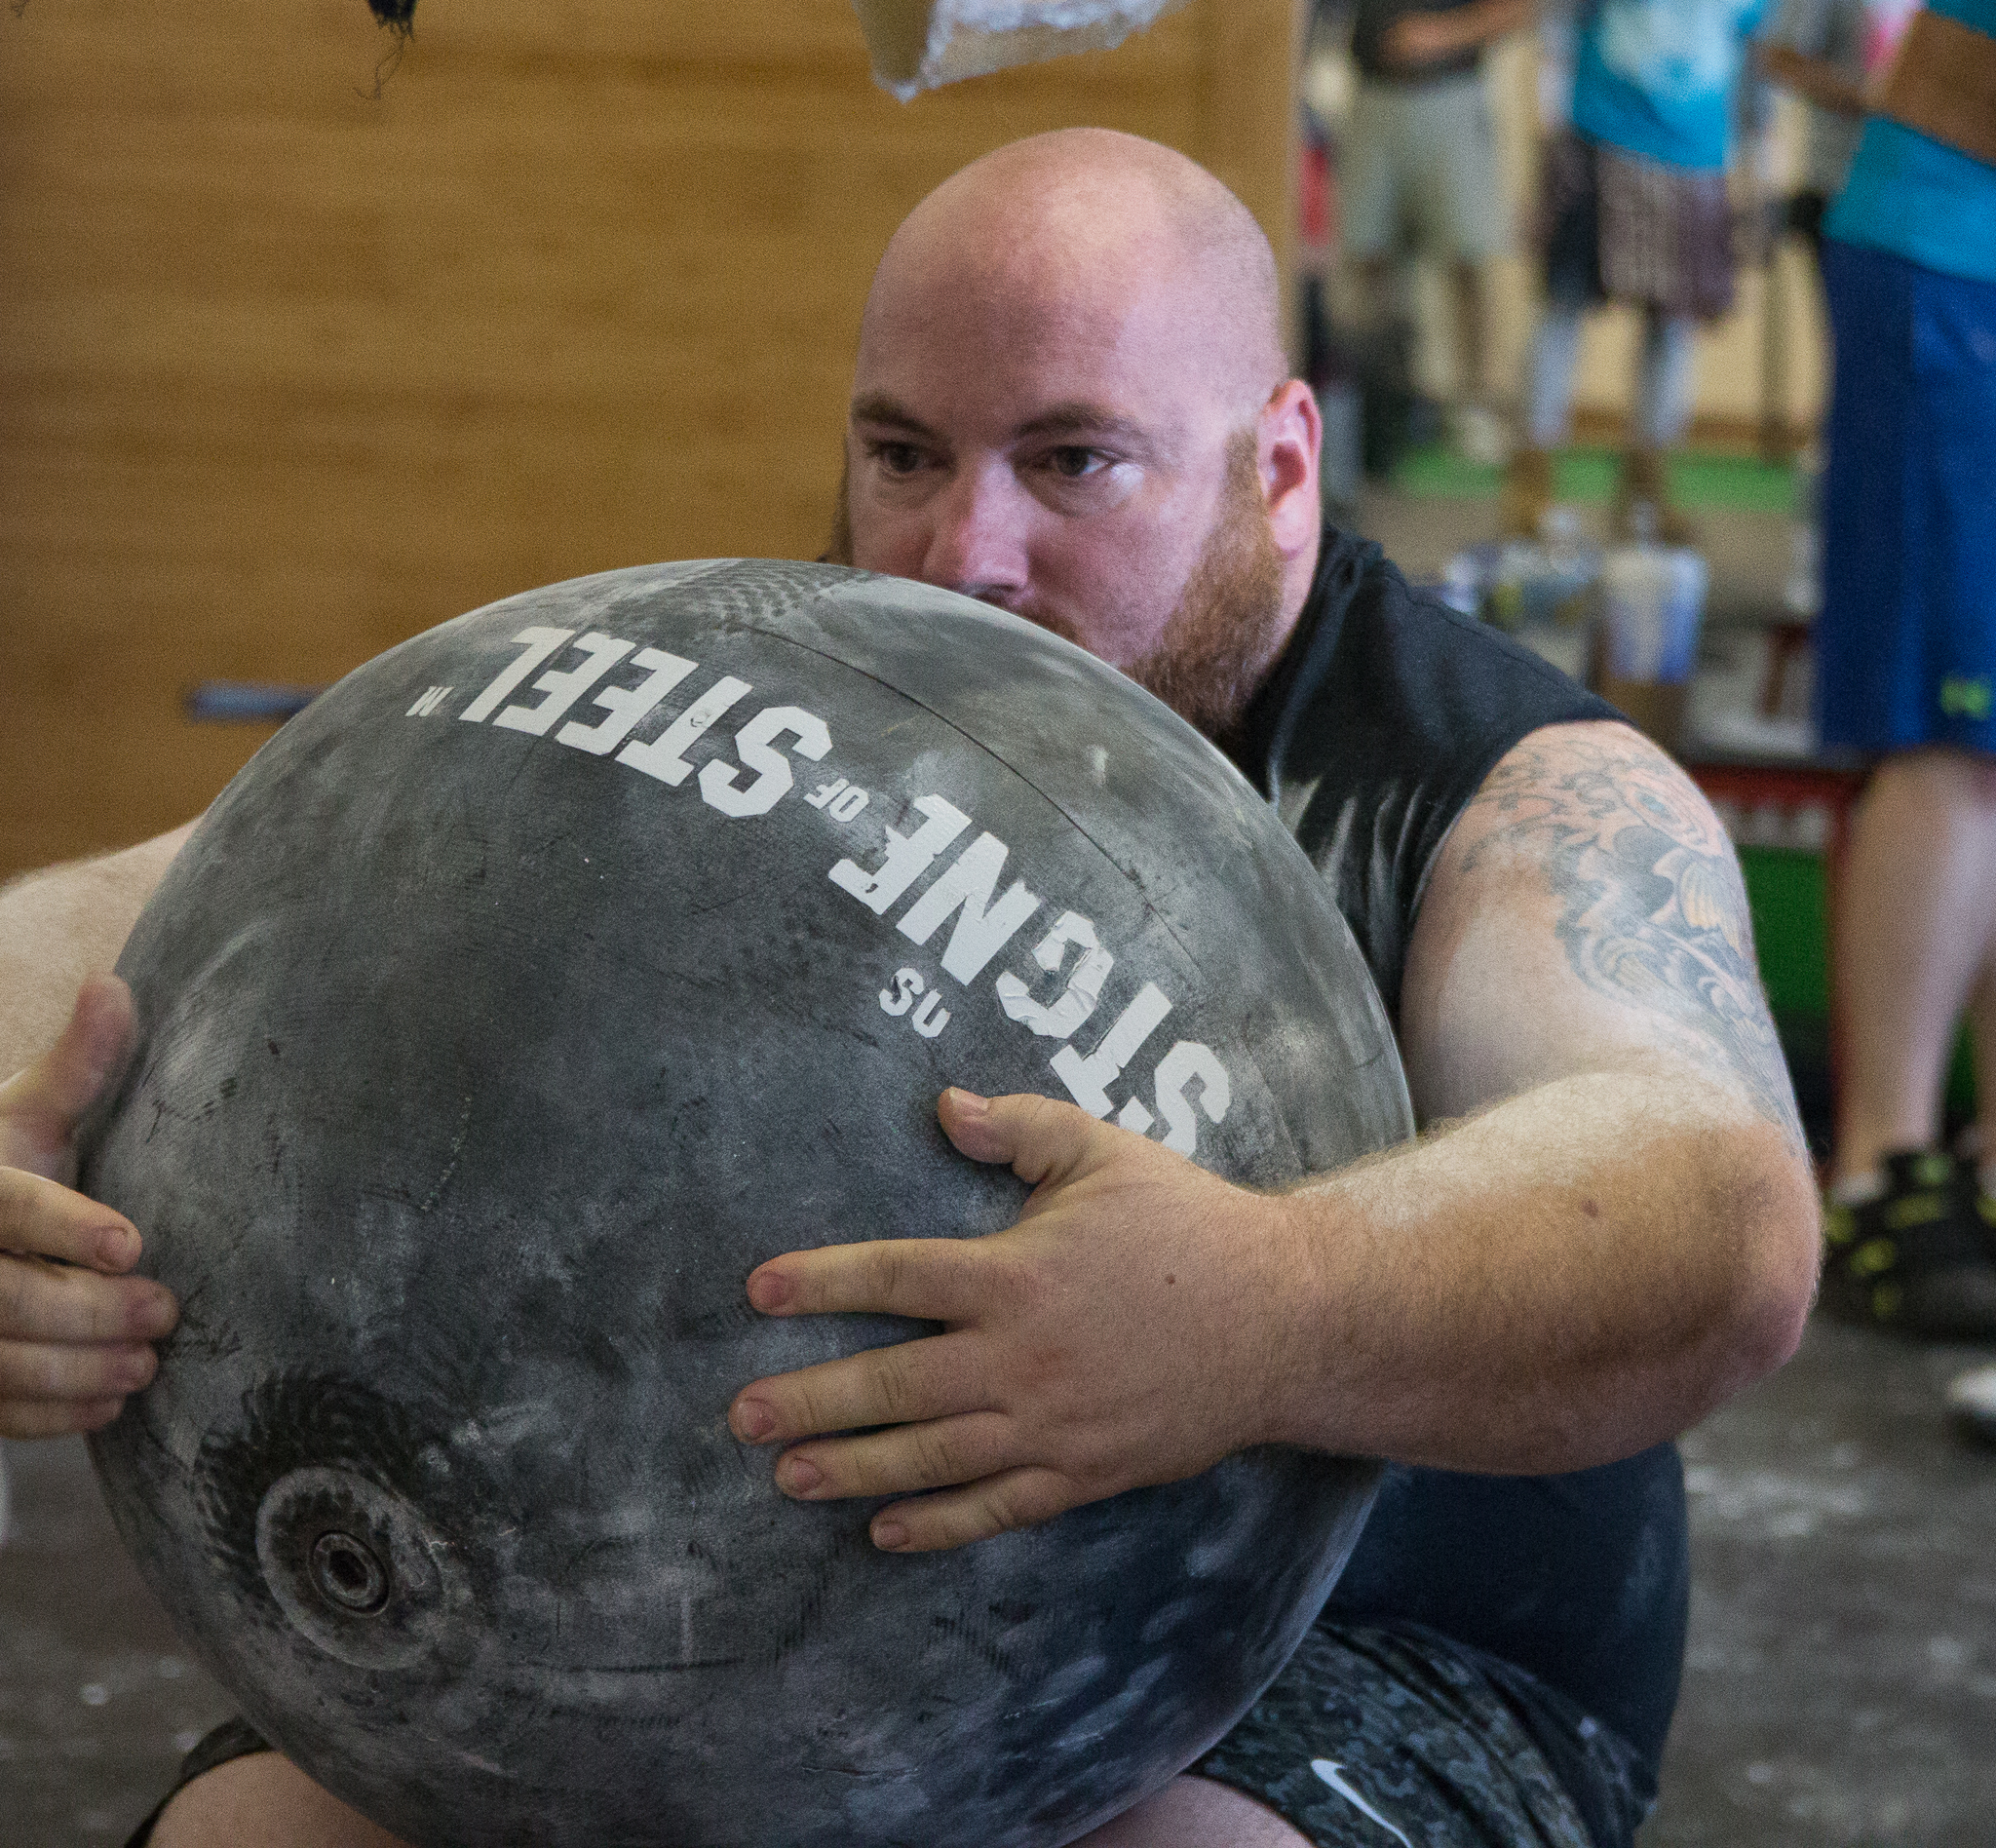 hurt-performance-4th-annual-little-viking-charity-washingtonville-new-york-strongman-eveyrdaylifters-vp (122 of 166).jpg